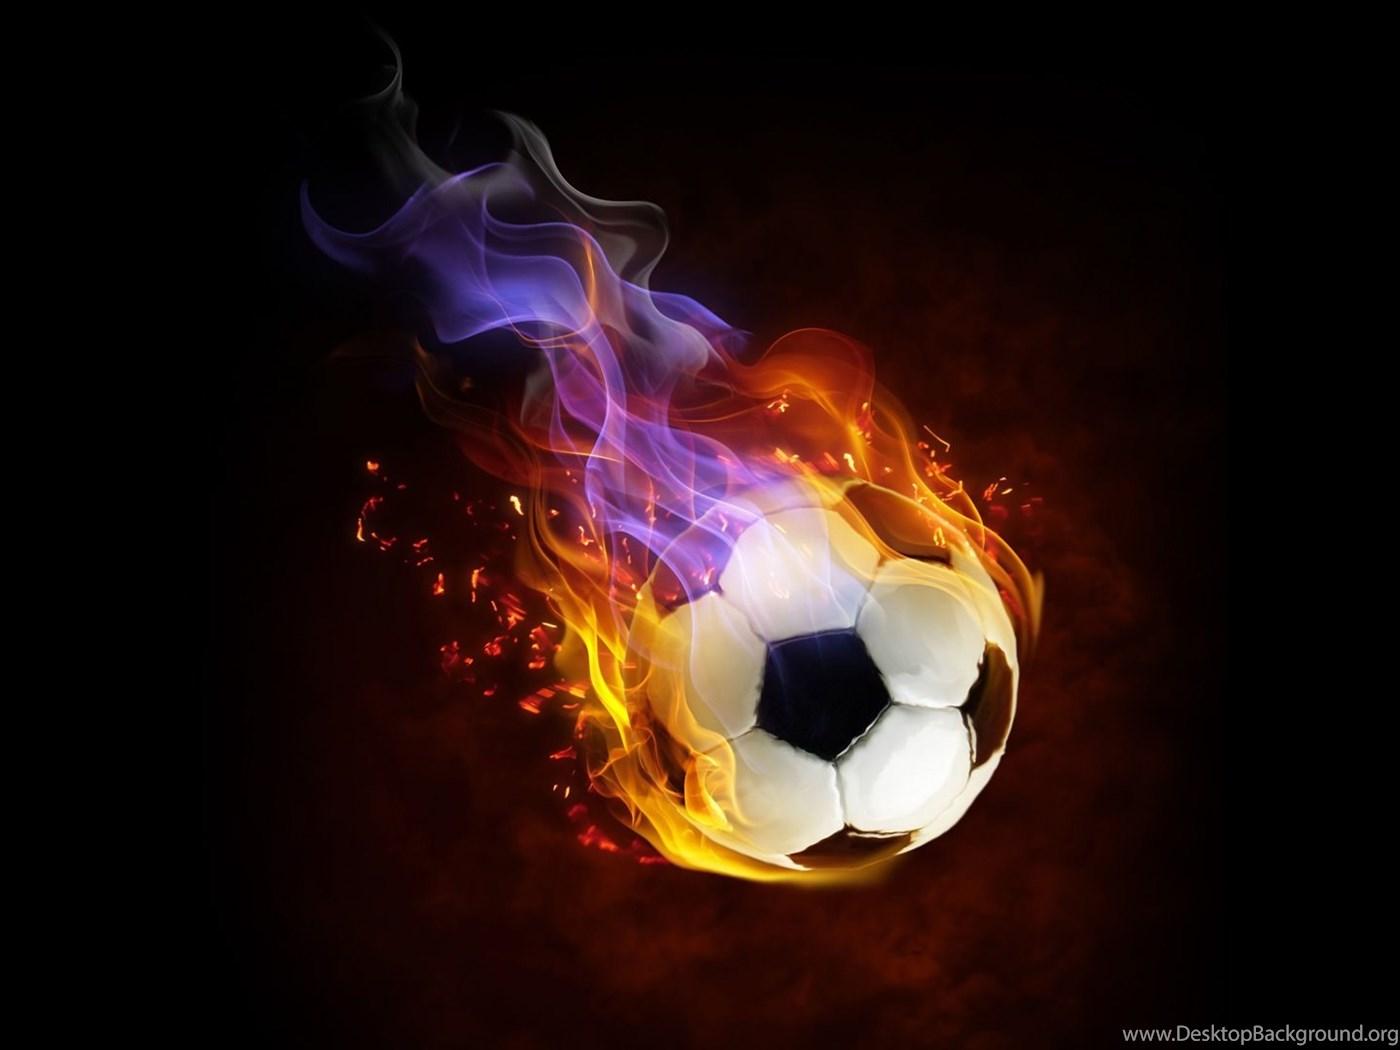 cool soccer ball wallpapers bing images desktop background